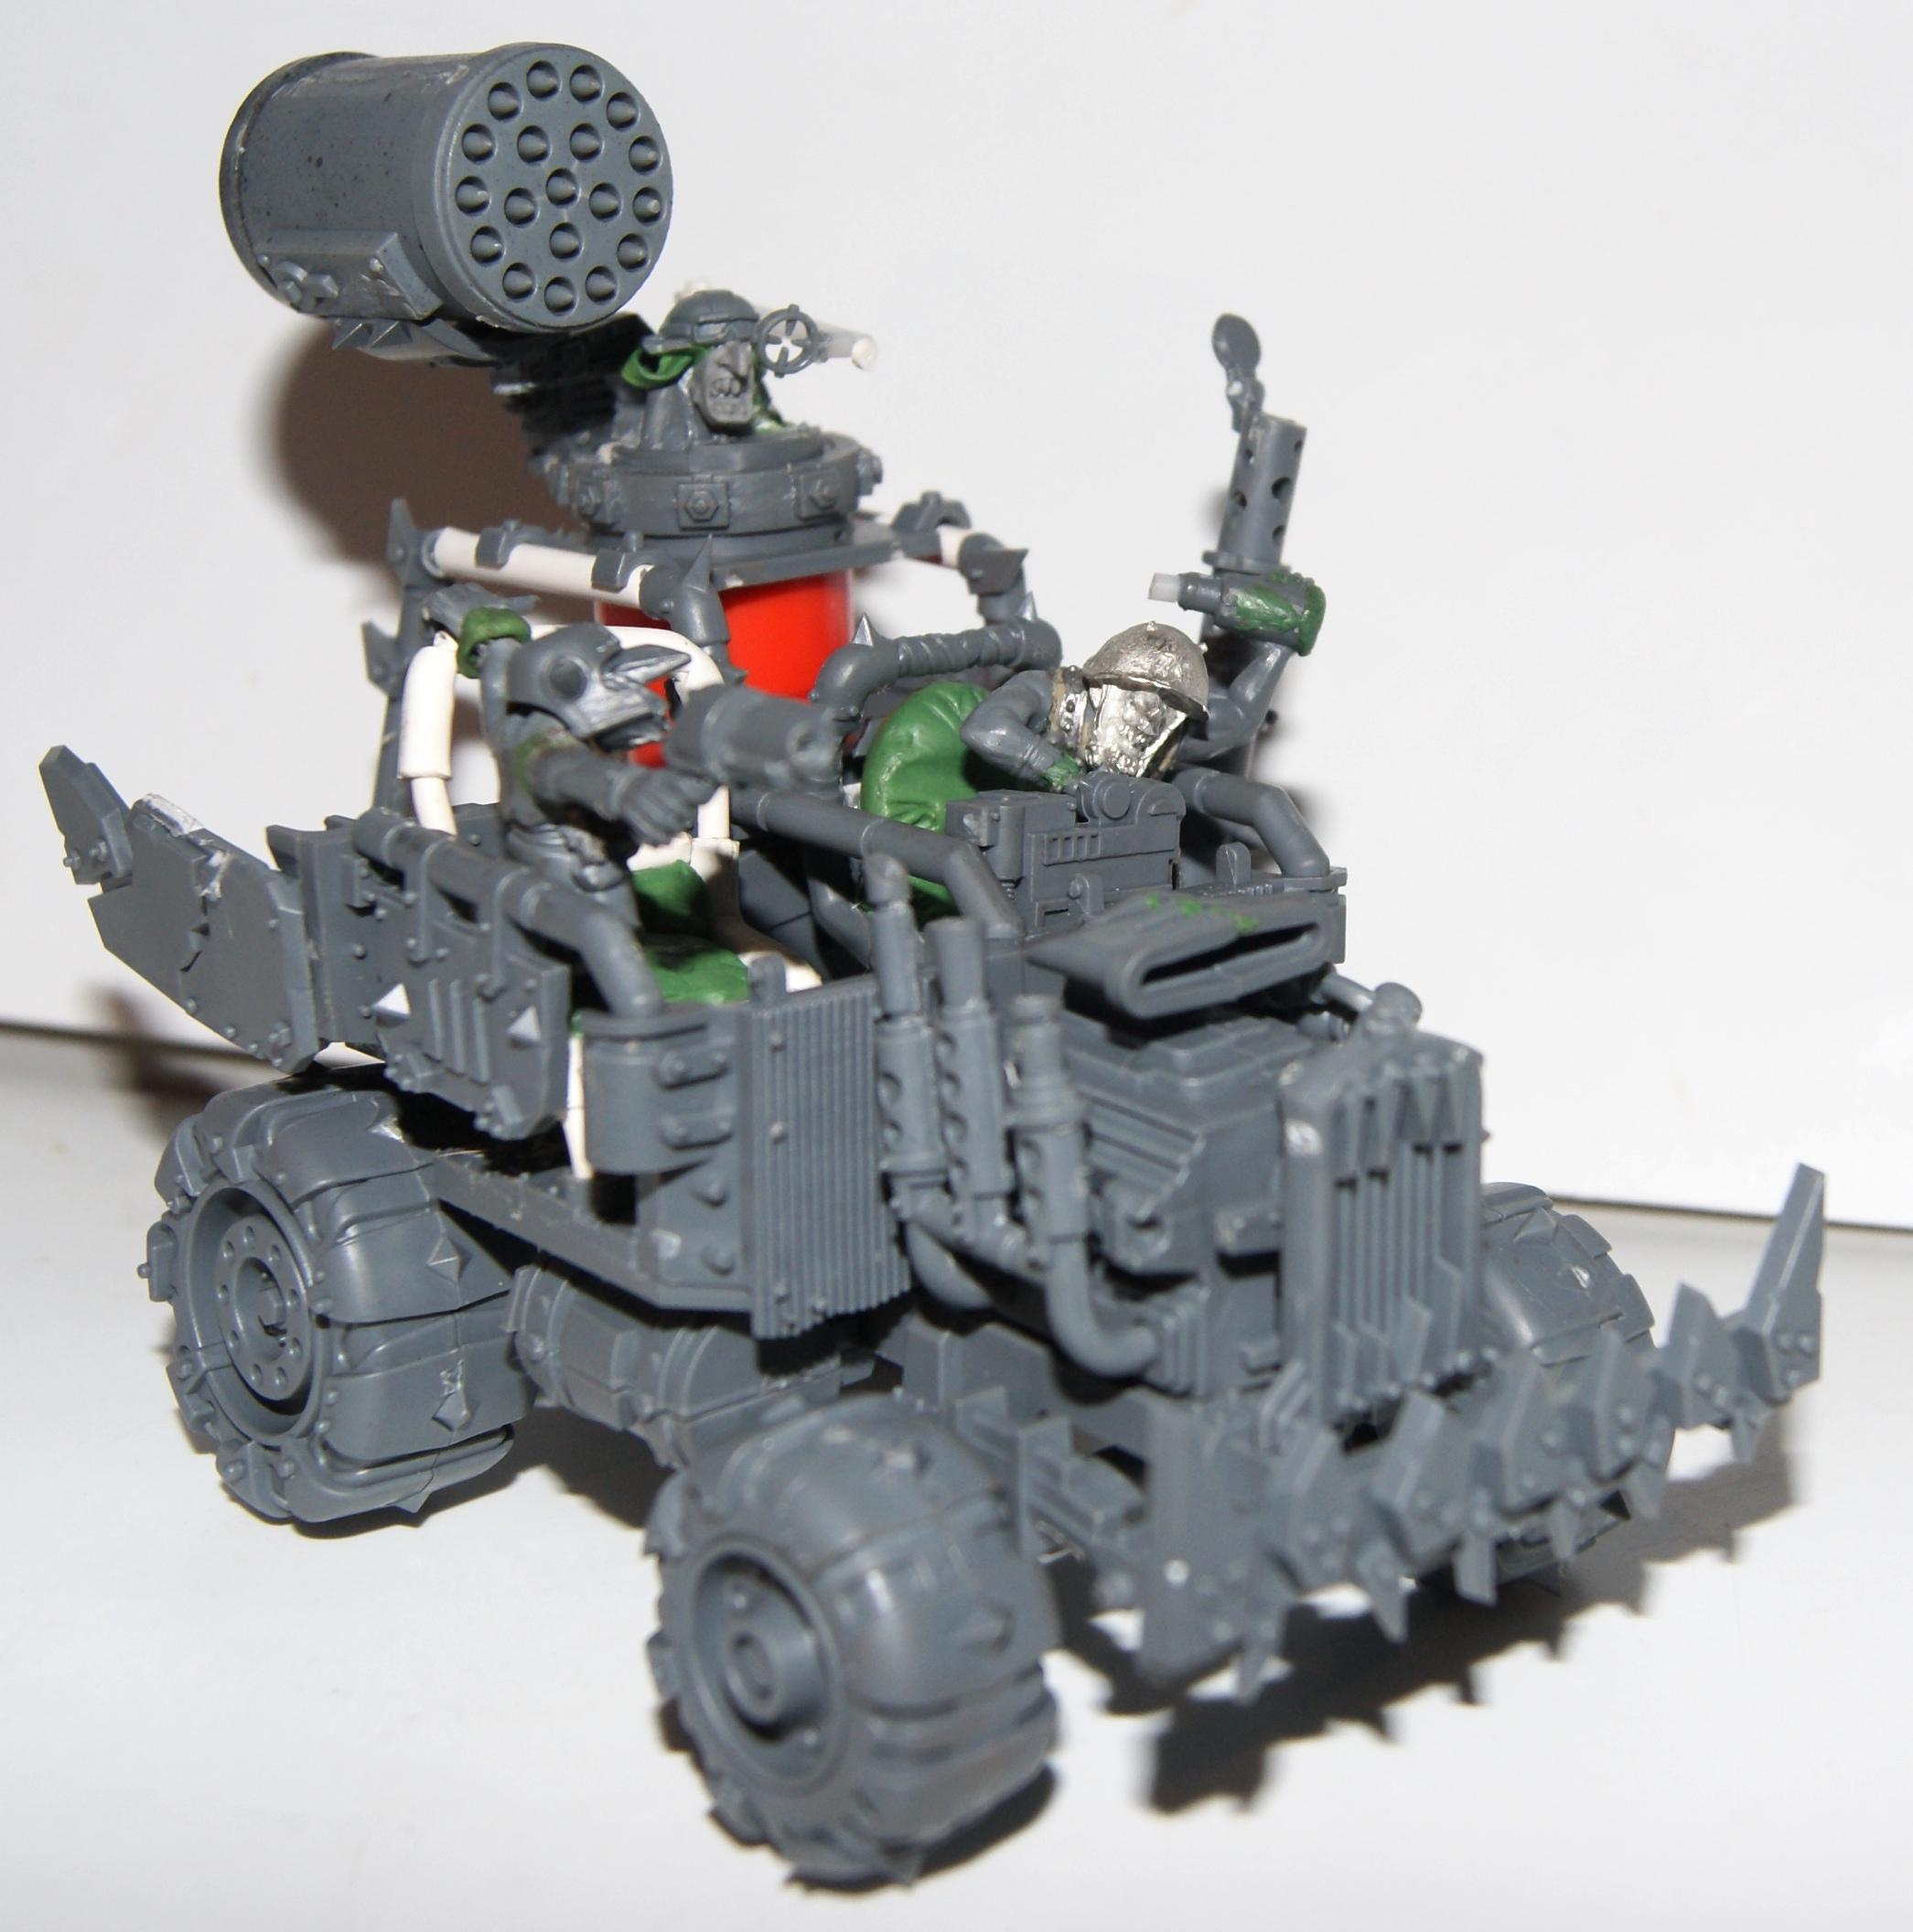 Buggy, Conversion, Grot Rebellion, Grot Rebels, Grots, Warhammer 40,000